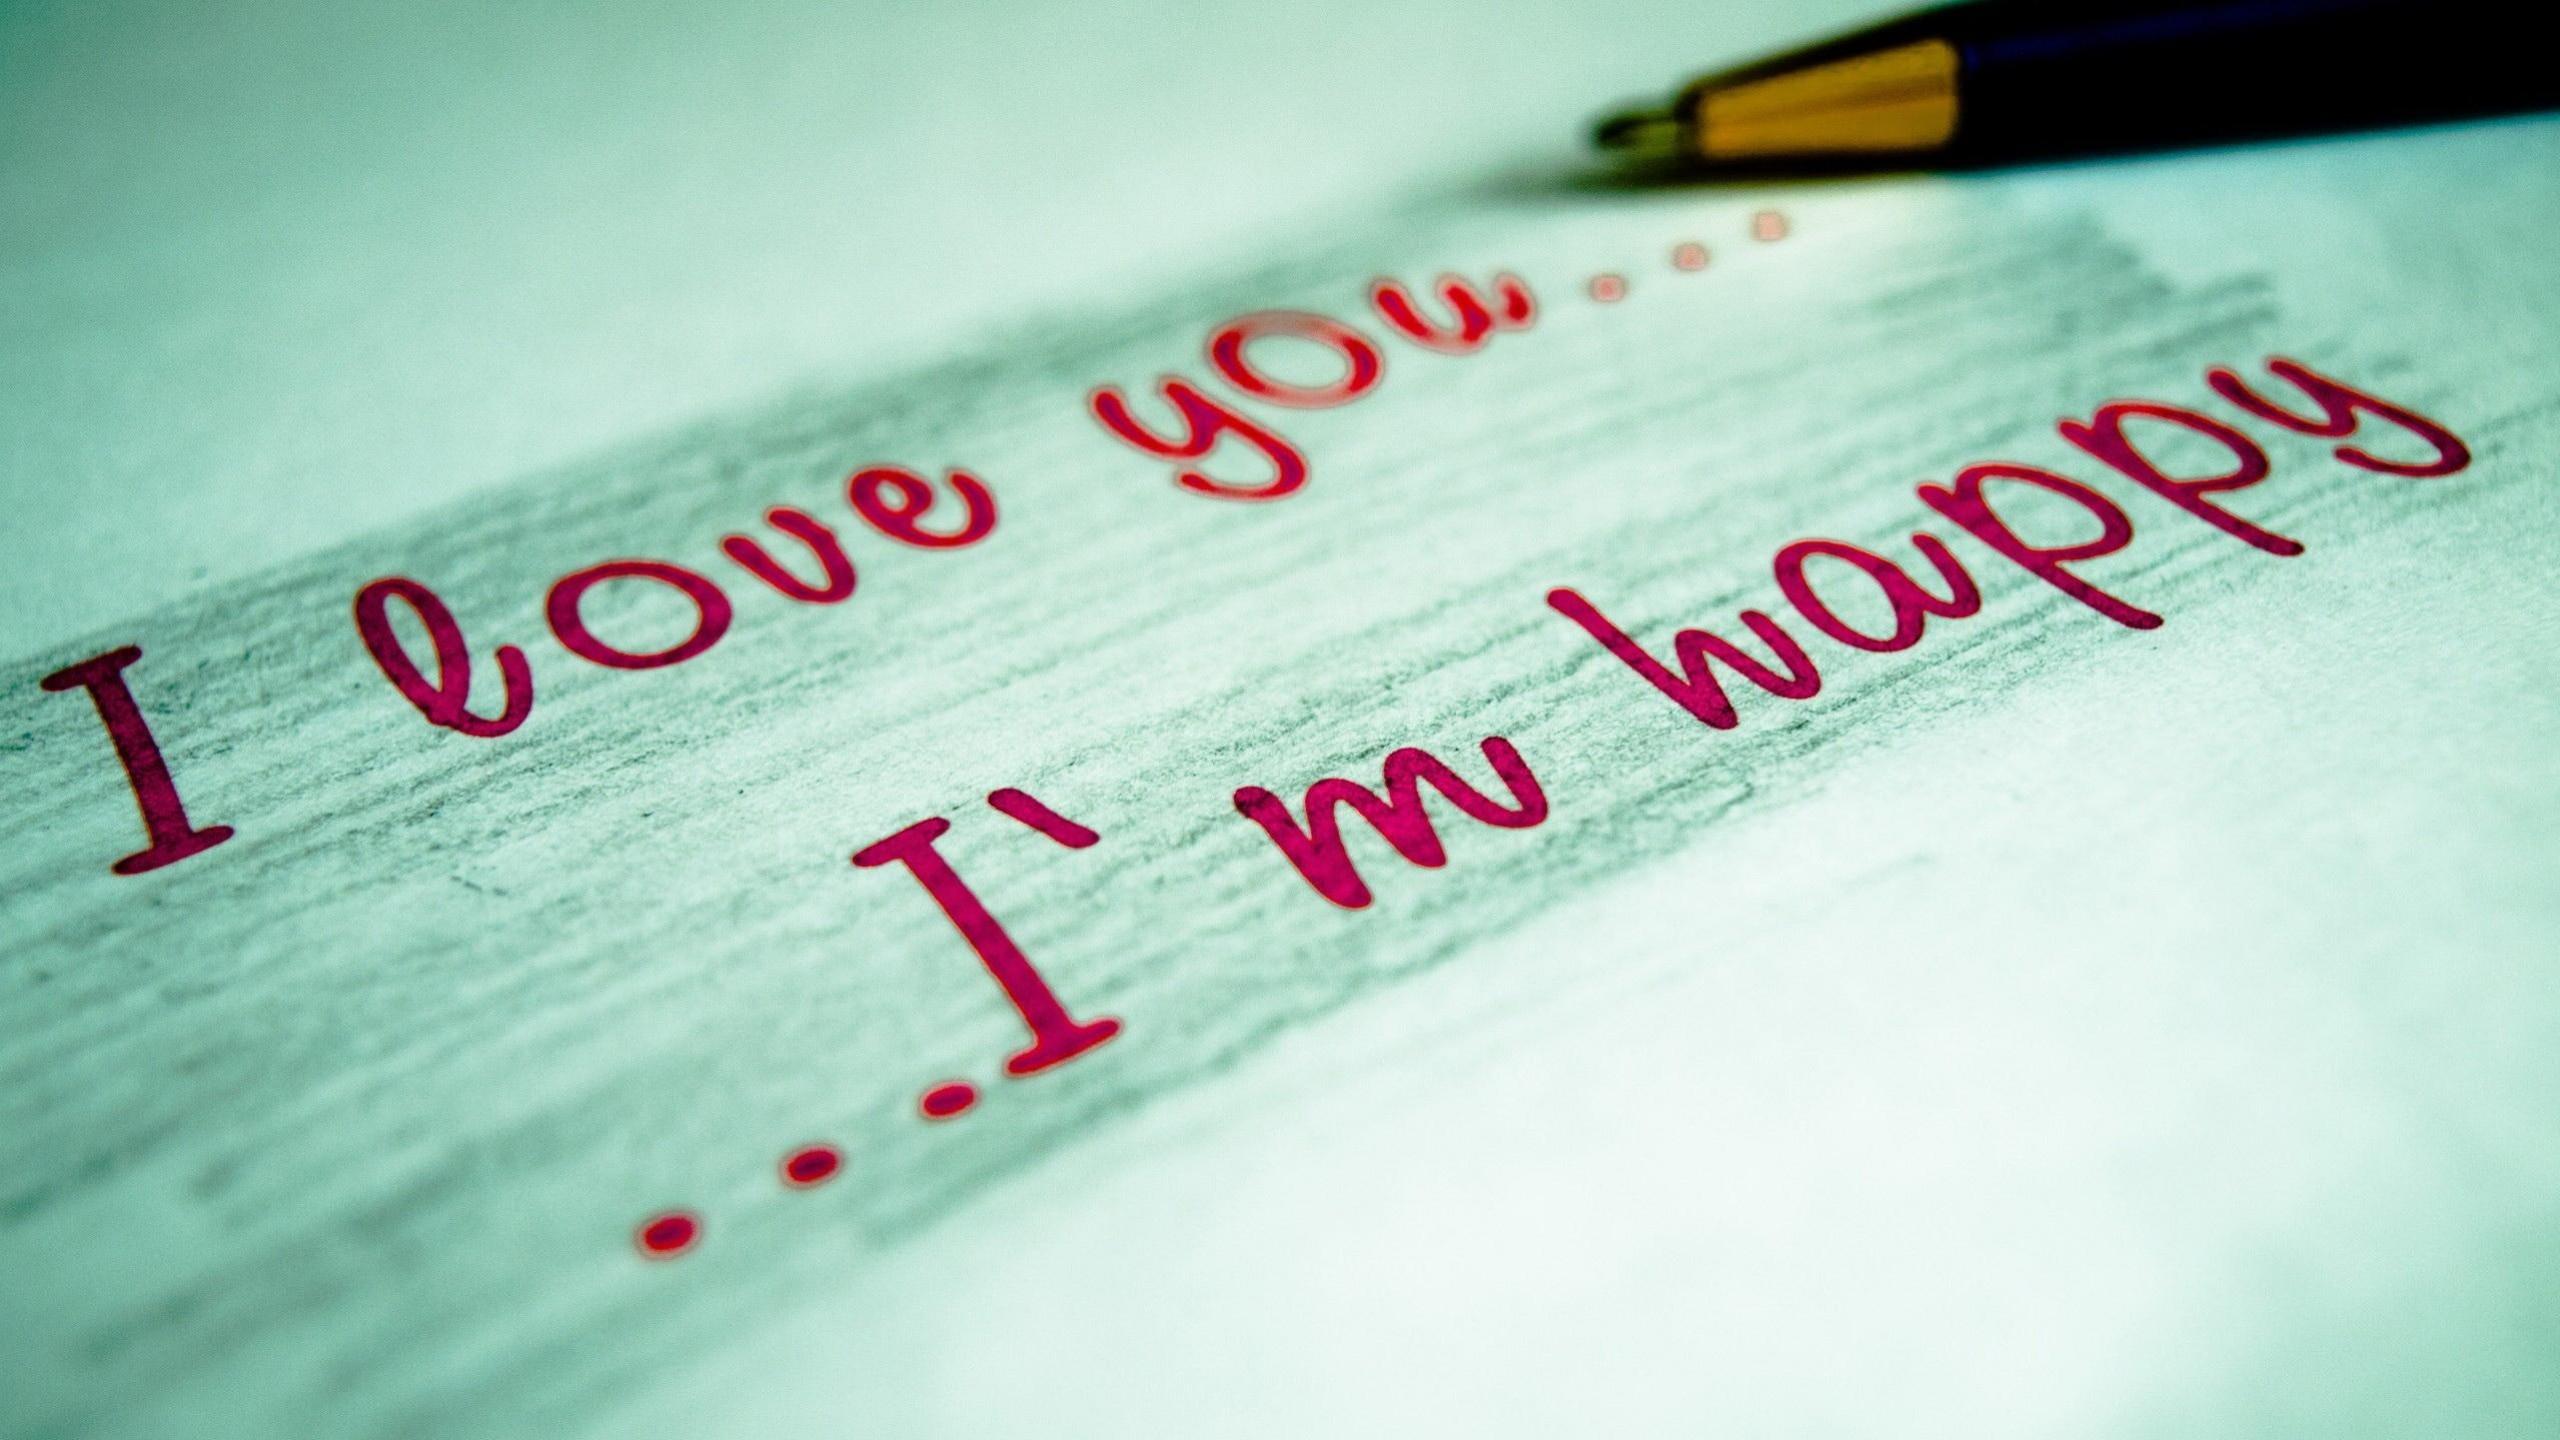 1920x1200 Wallpaper Resolutions Source I Love You M Happy True Message Mac Download Free